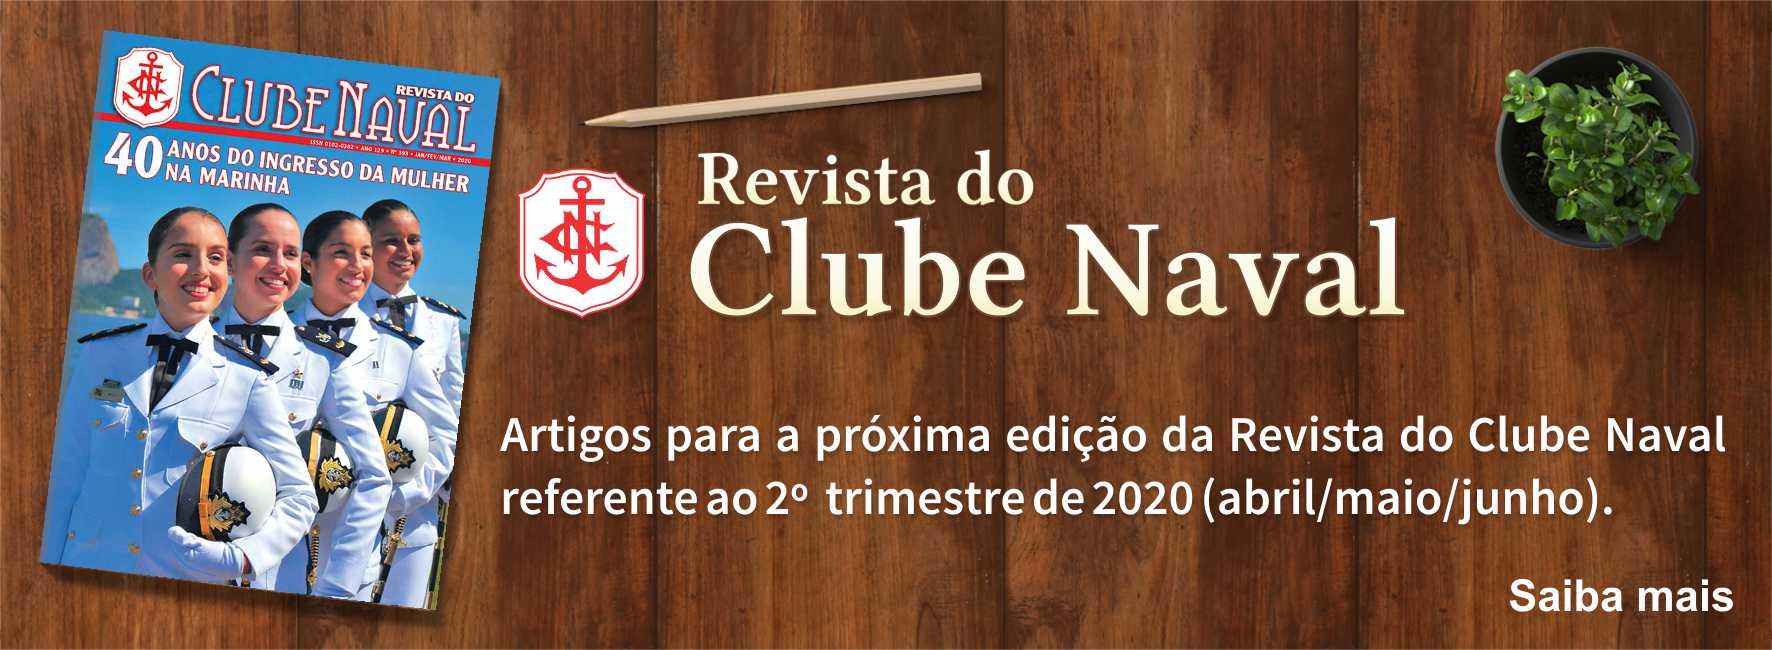 https://www.clubenaval.org.br/novo/?q=artigos-para-pr%C3%B3xima-edi%C3%A7%C3%A3o-da-revista-do-clube-naval